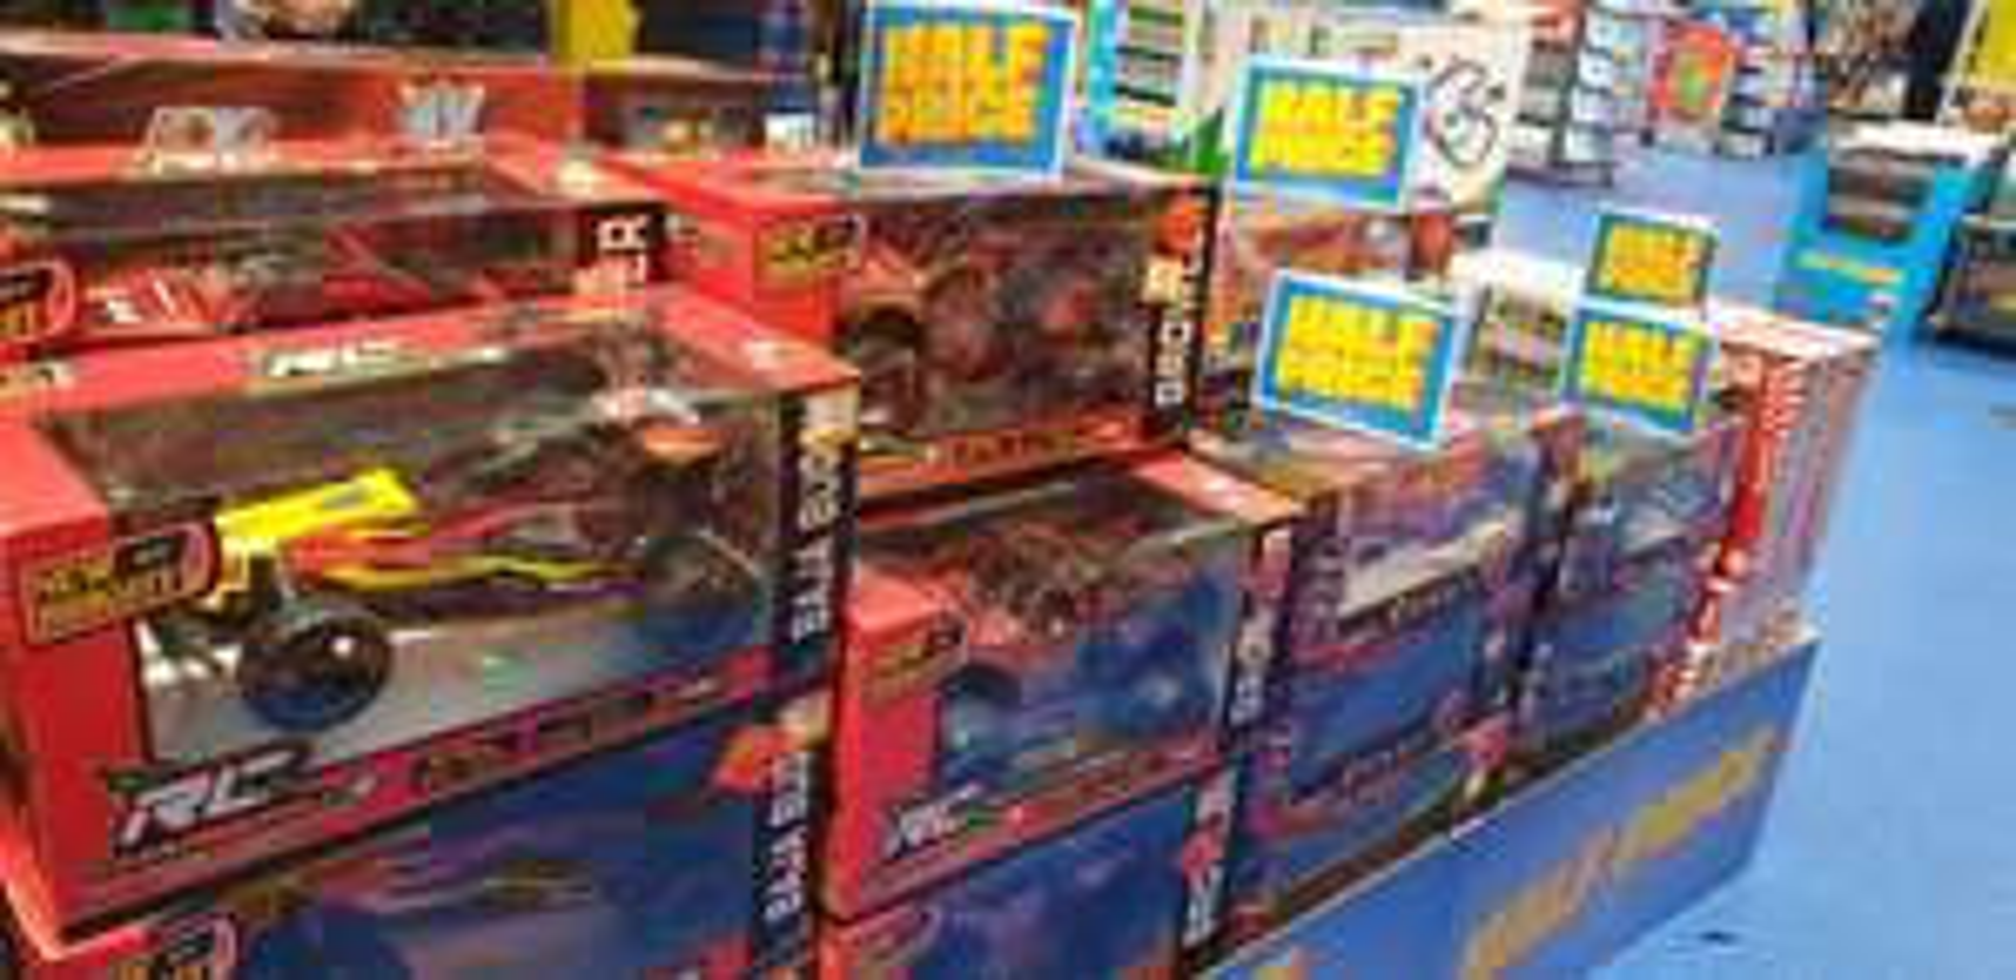 Half Price Toys - Smyths Meadowhall Retail Park Sheffield